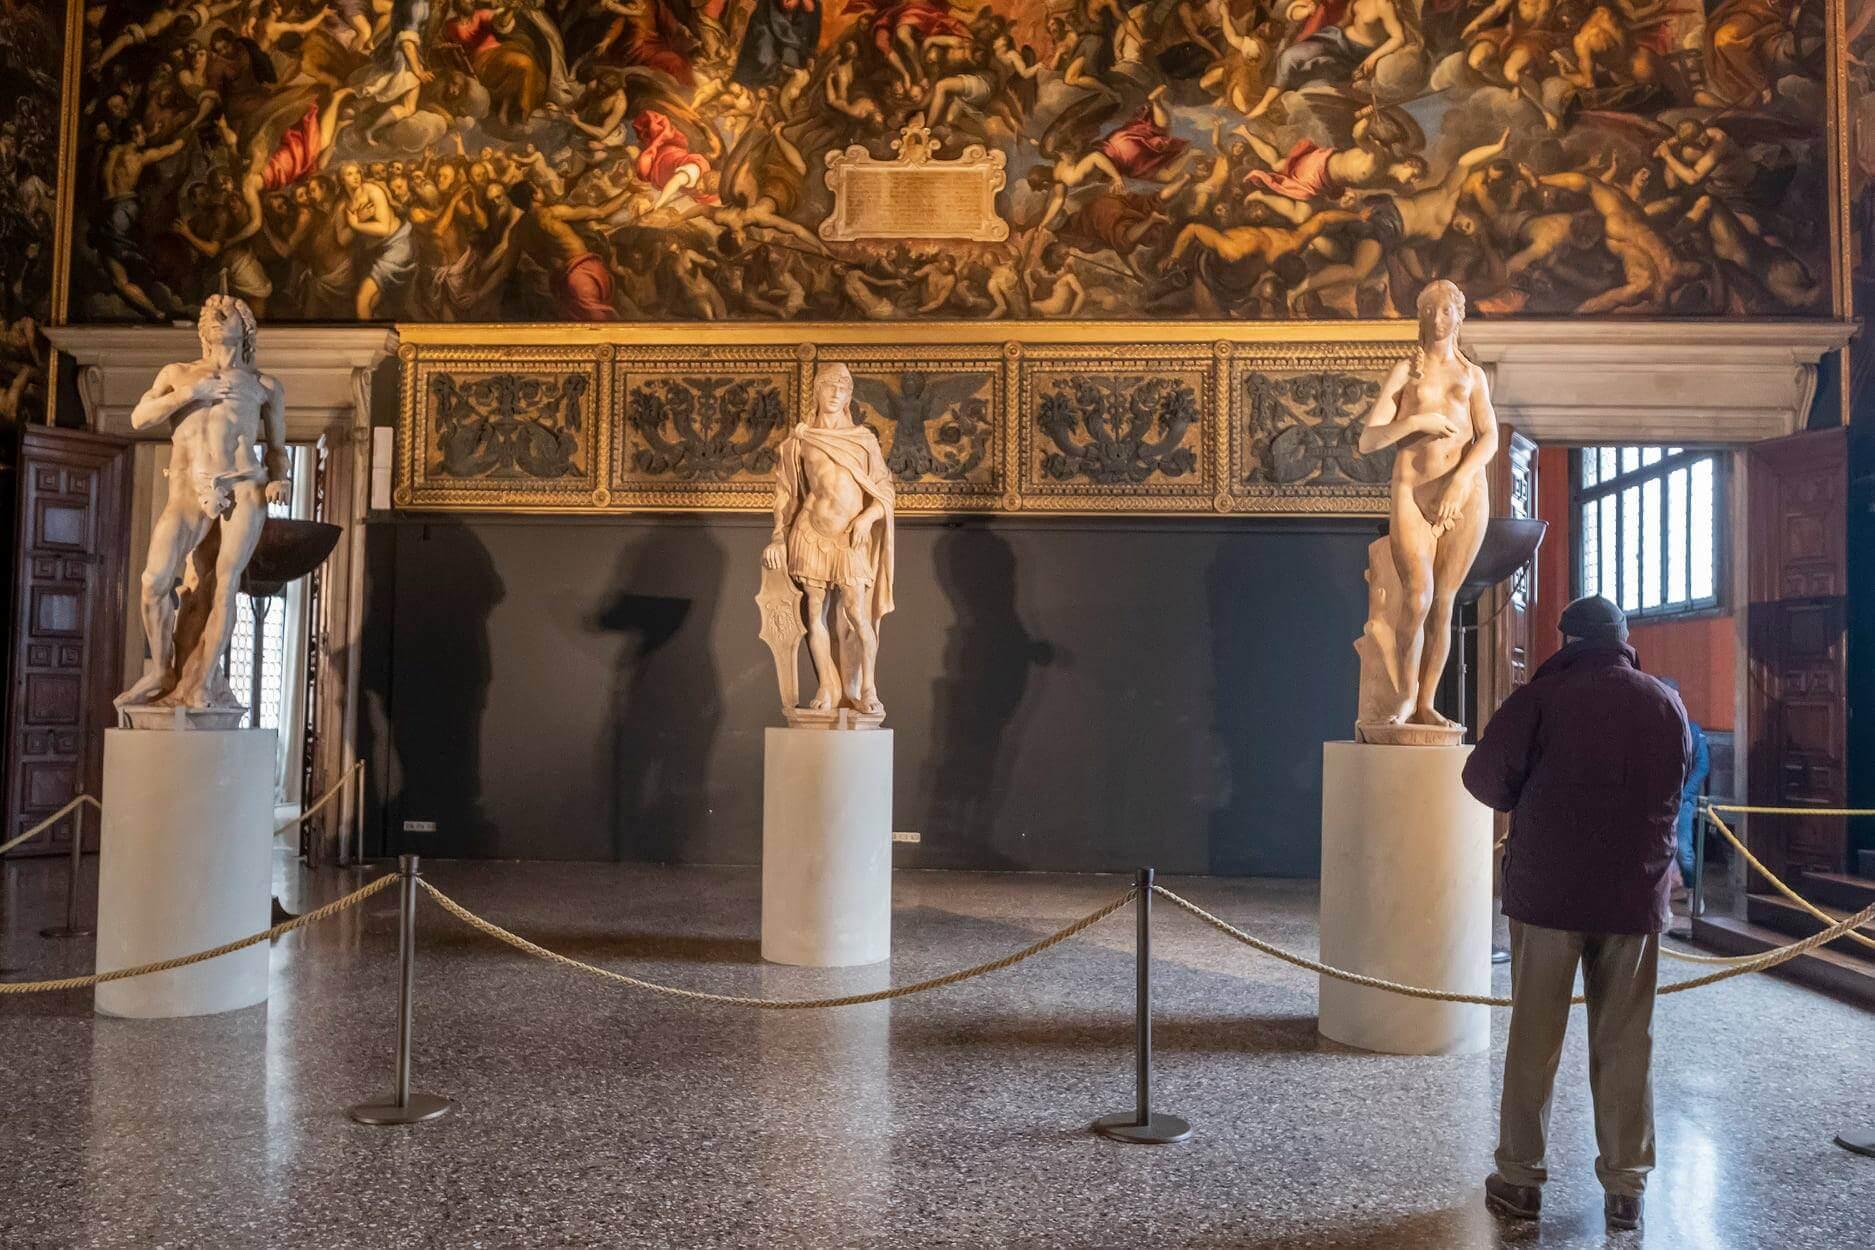 Antonio Rizzo's Adam and Eve